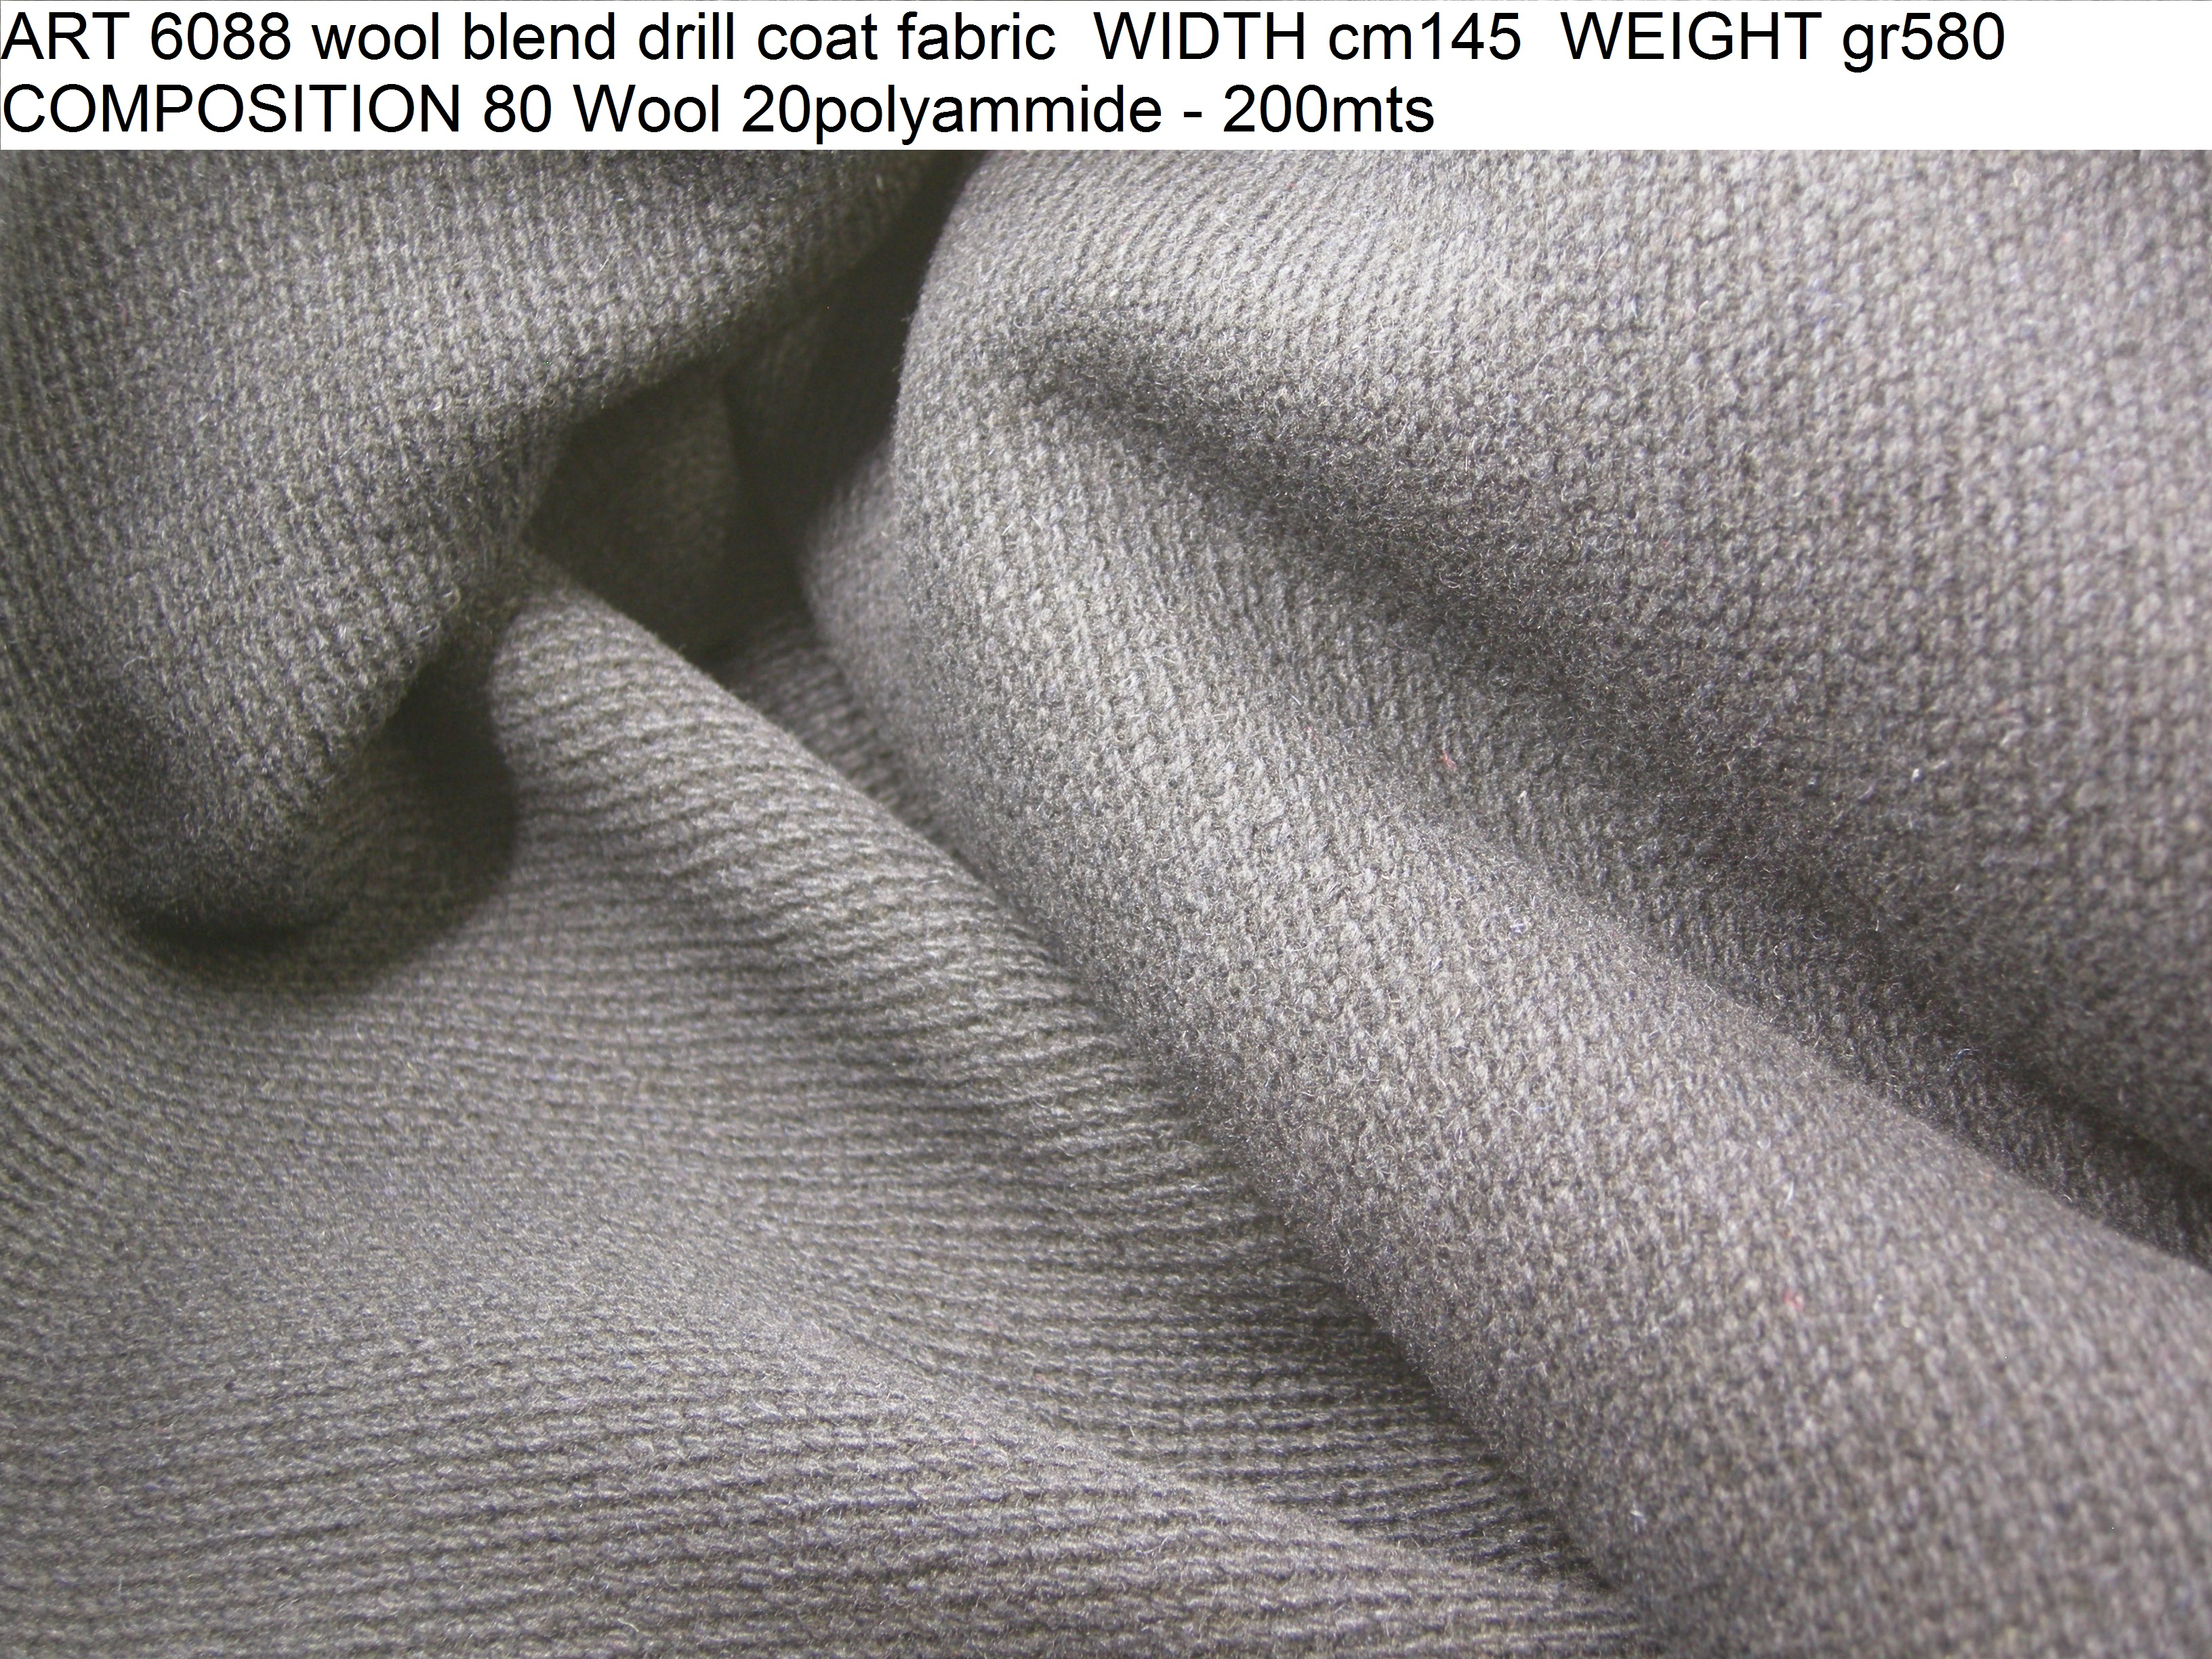 ART 6088 wool blend drill coat fabric WIDTH cm145 WEIGHT gr580 COMPOSITION 80 Wool 20polyammide - 200mts